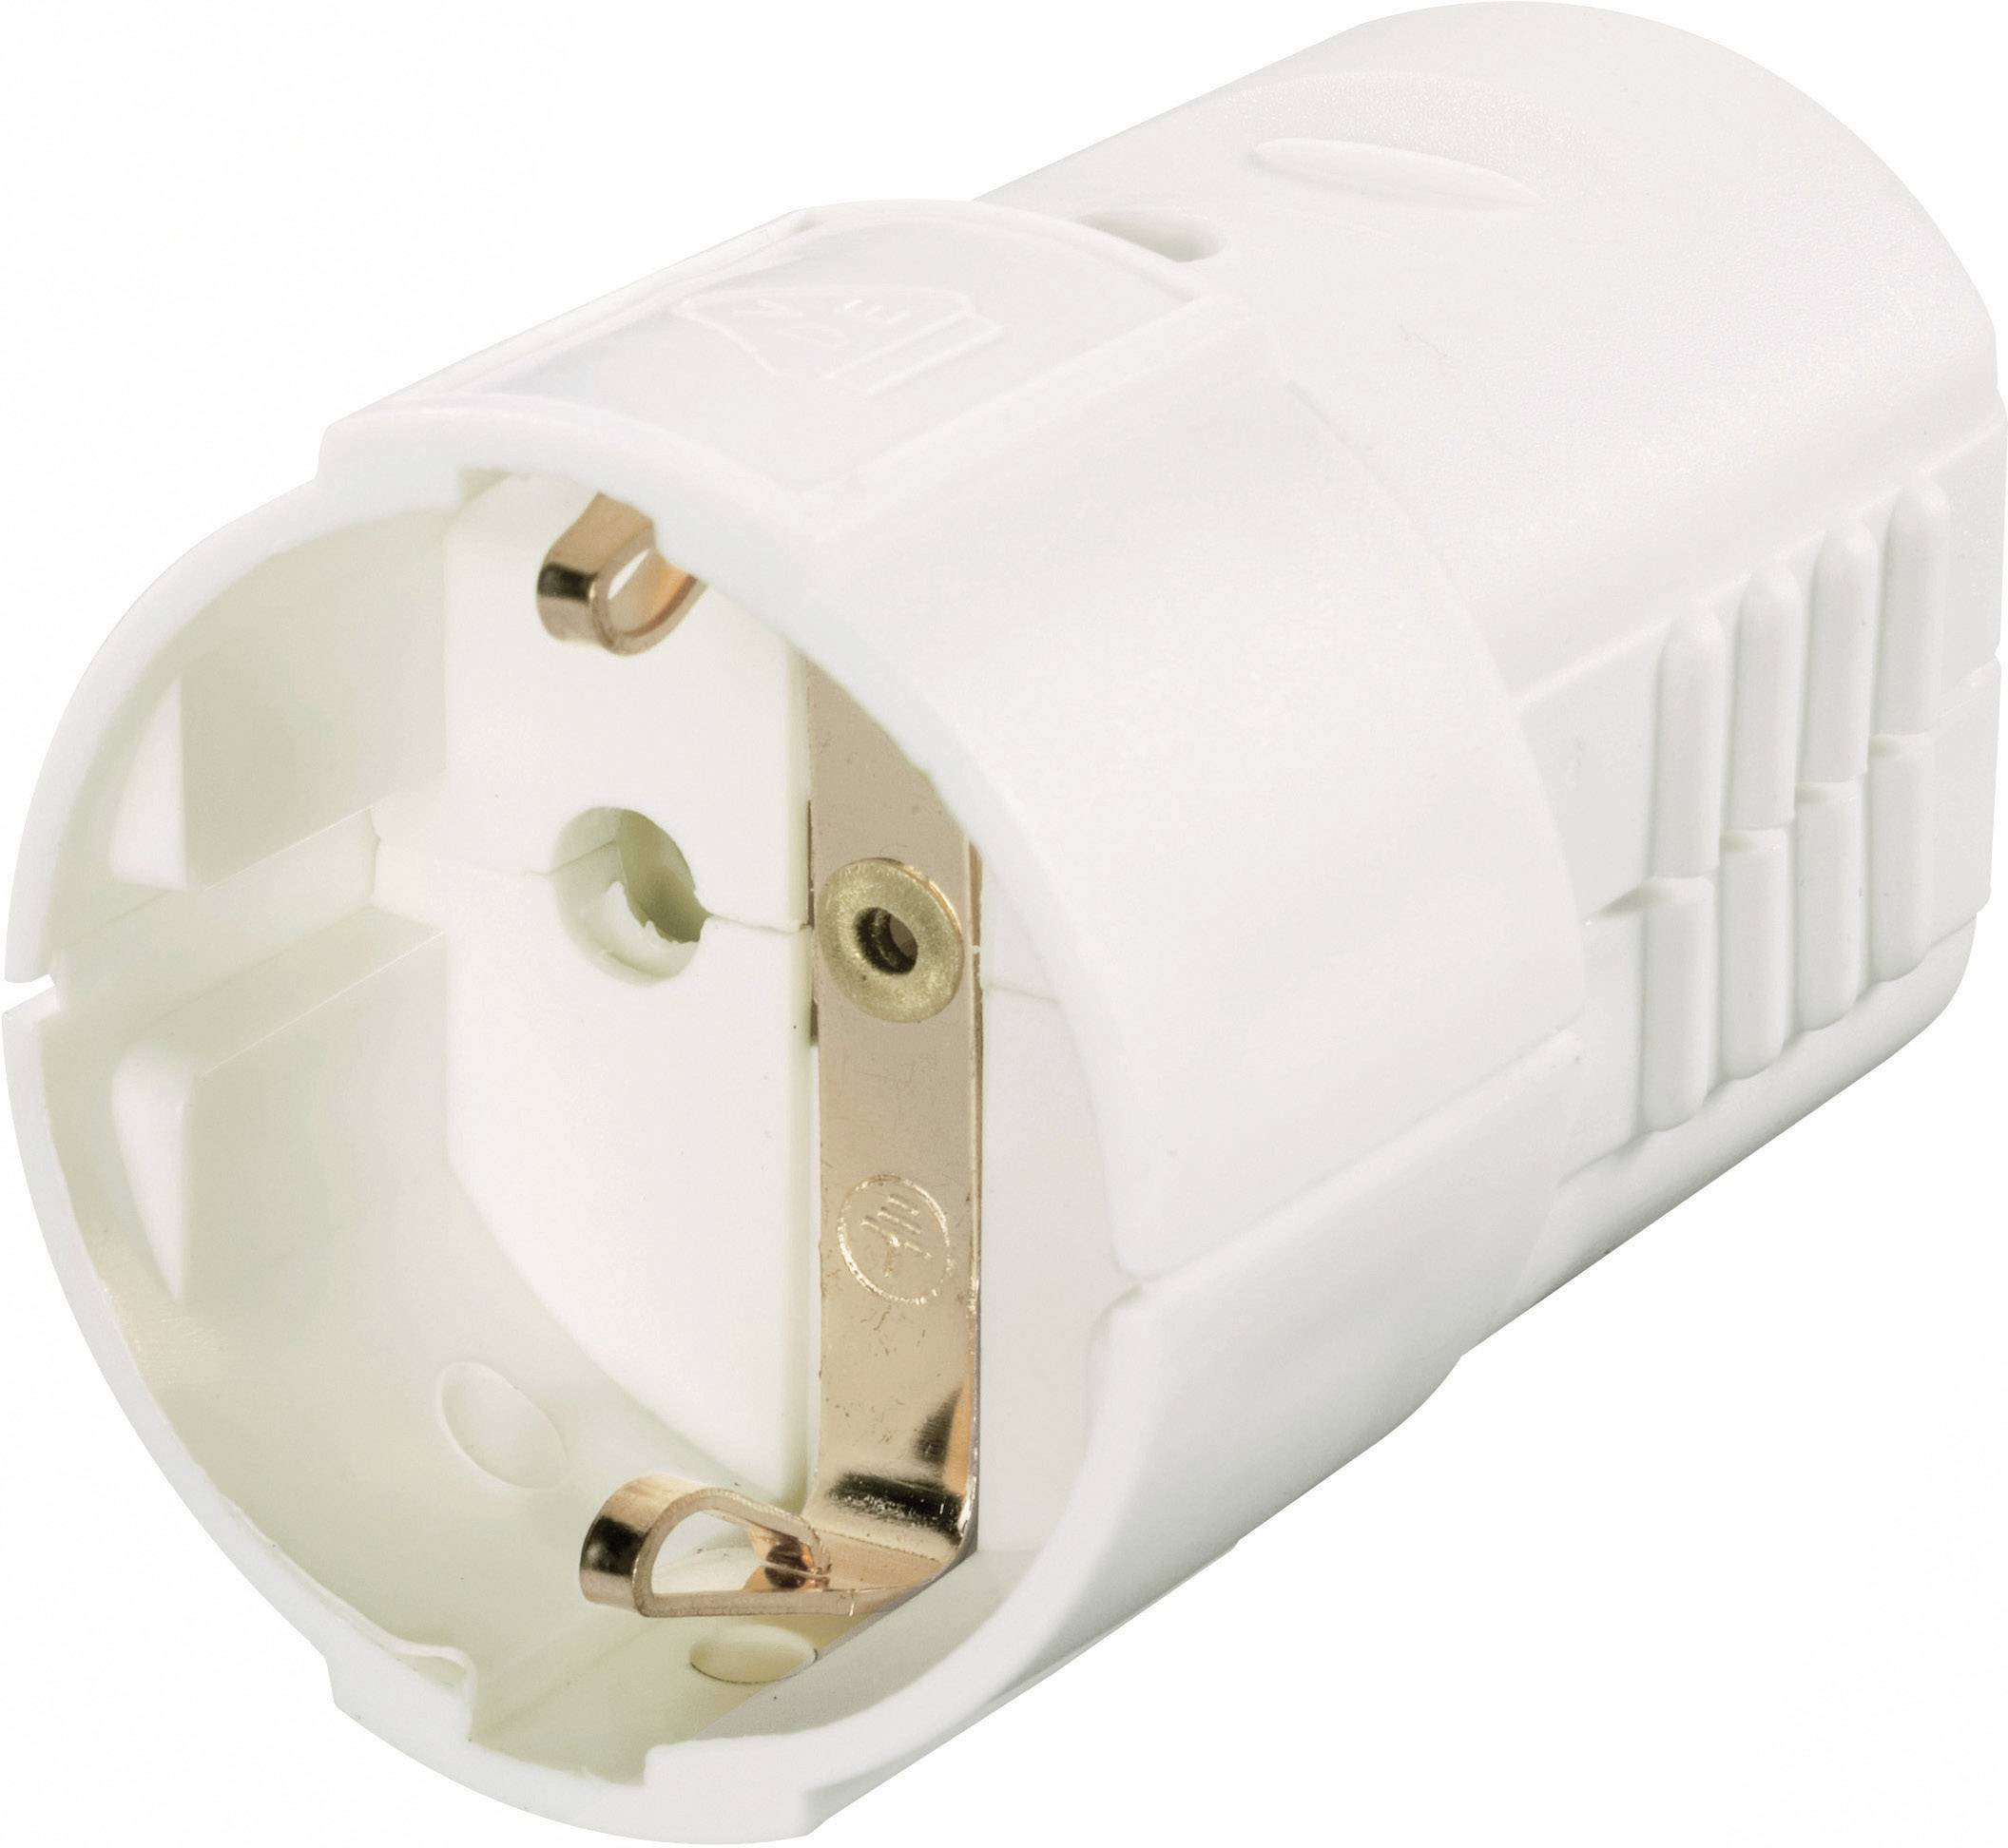 Prepojka SchuKo GAO 627747, umelá hmota, IP20, 230 V, biela